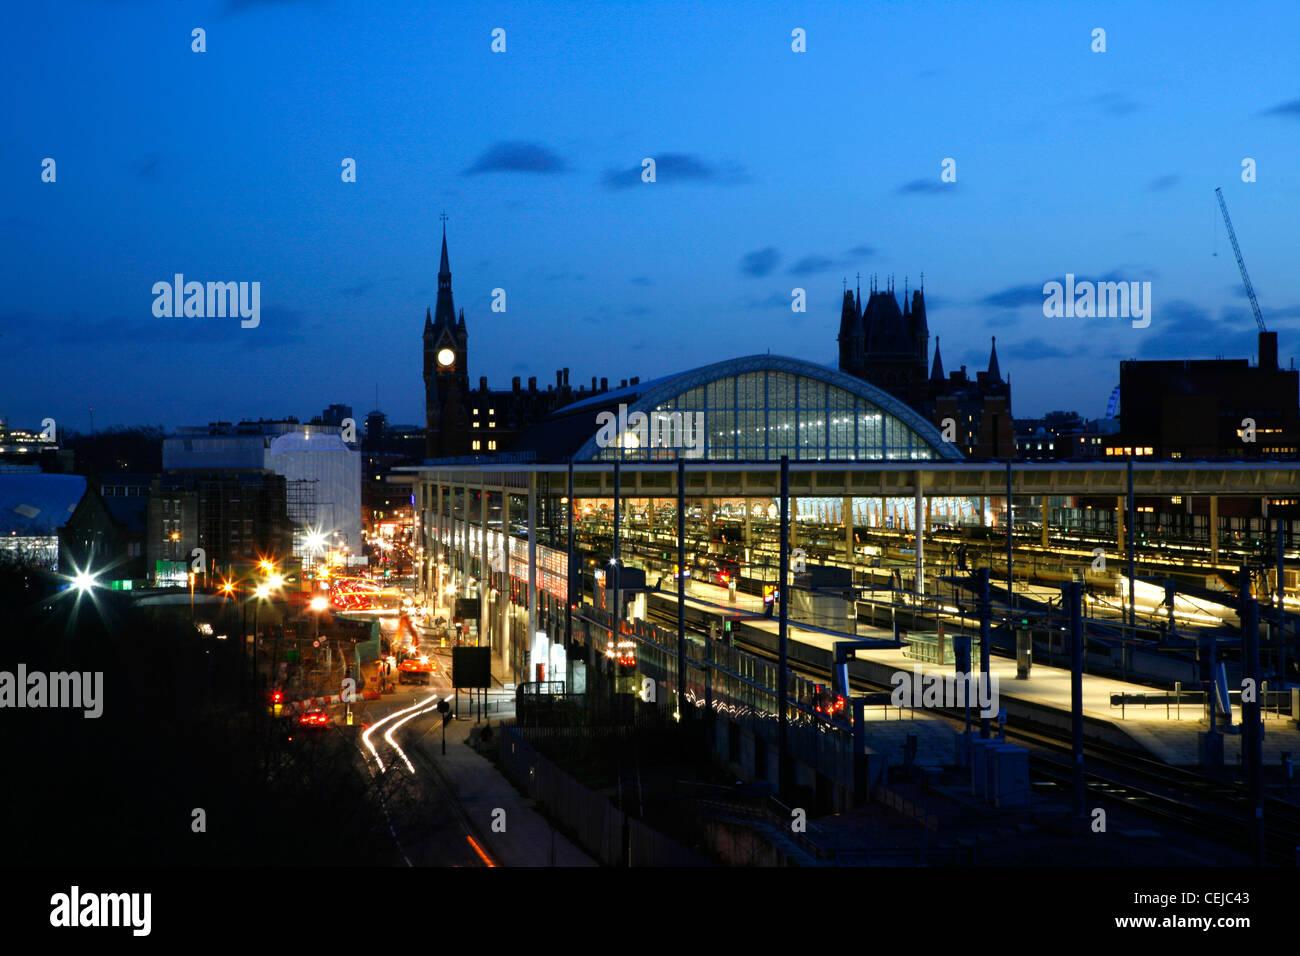 Skyline night view of St Pancras Station, St Pancras, London, UK - Stock Image